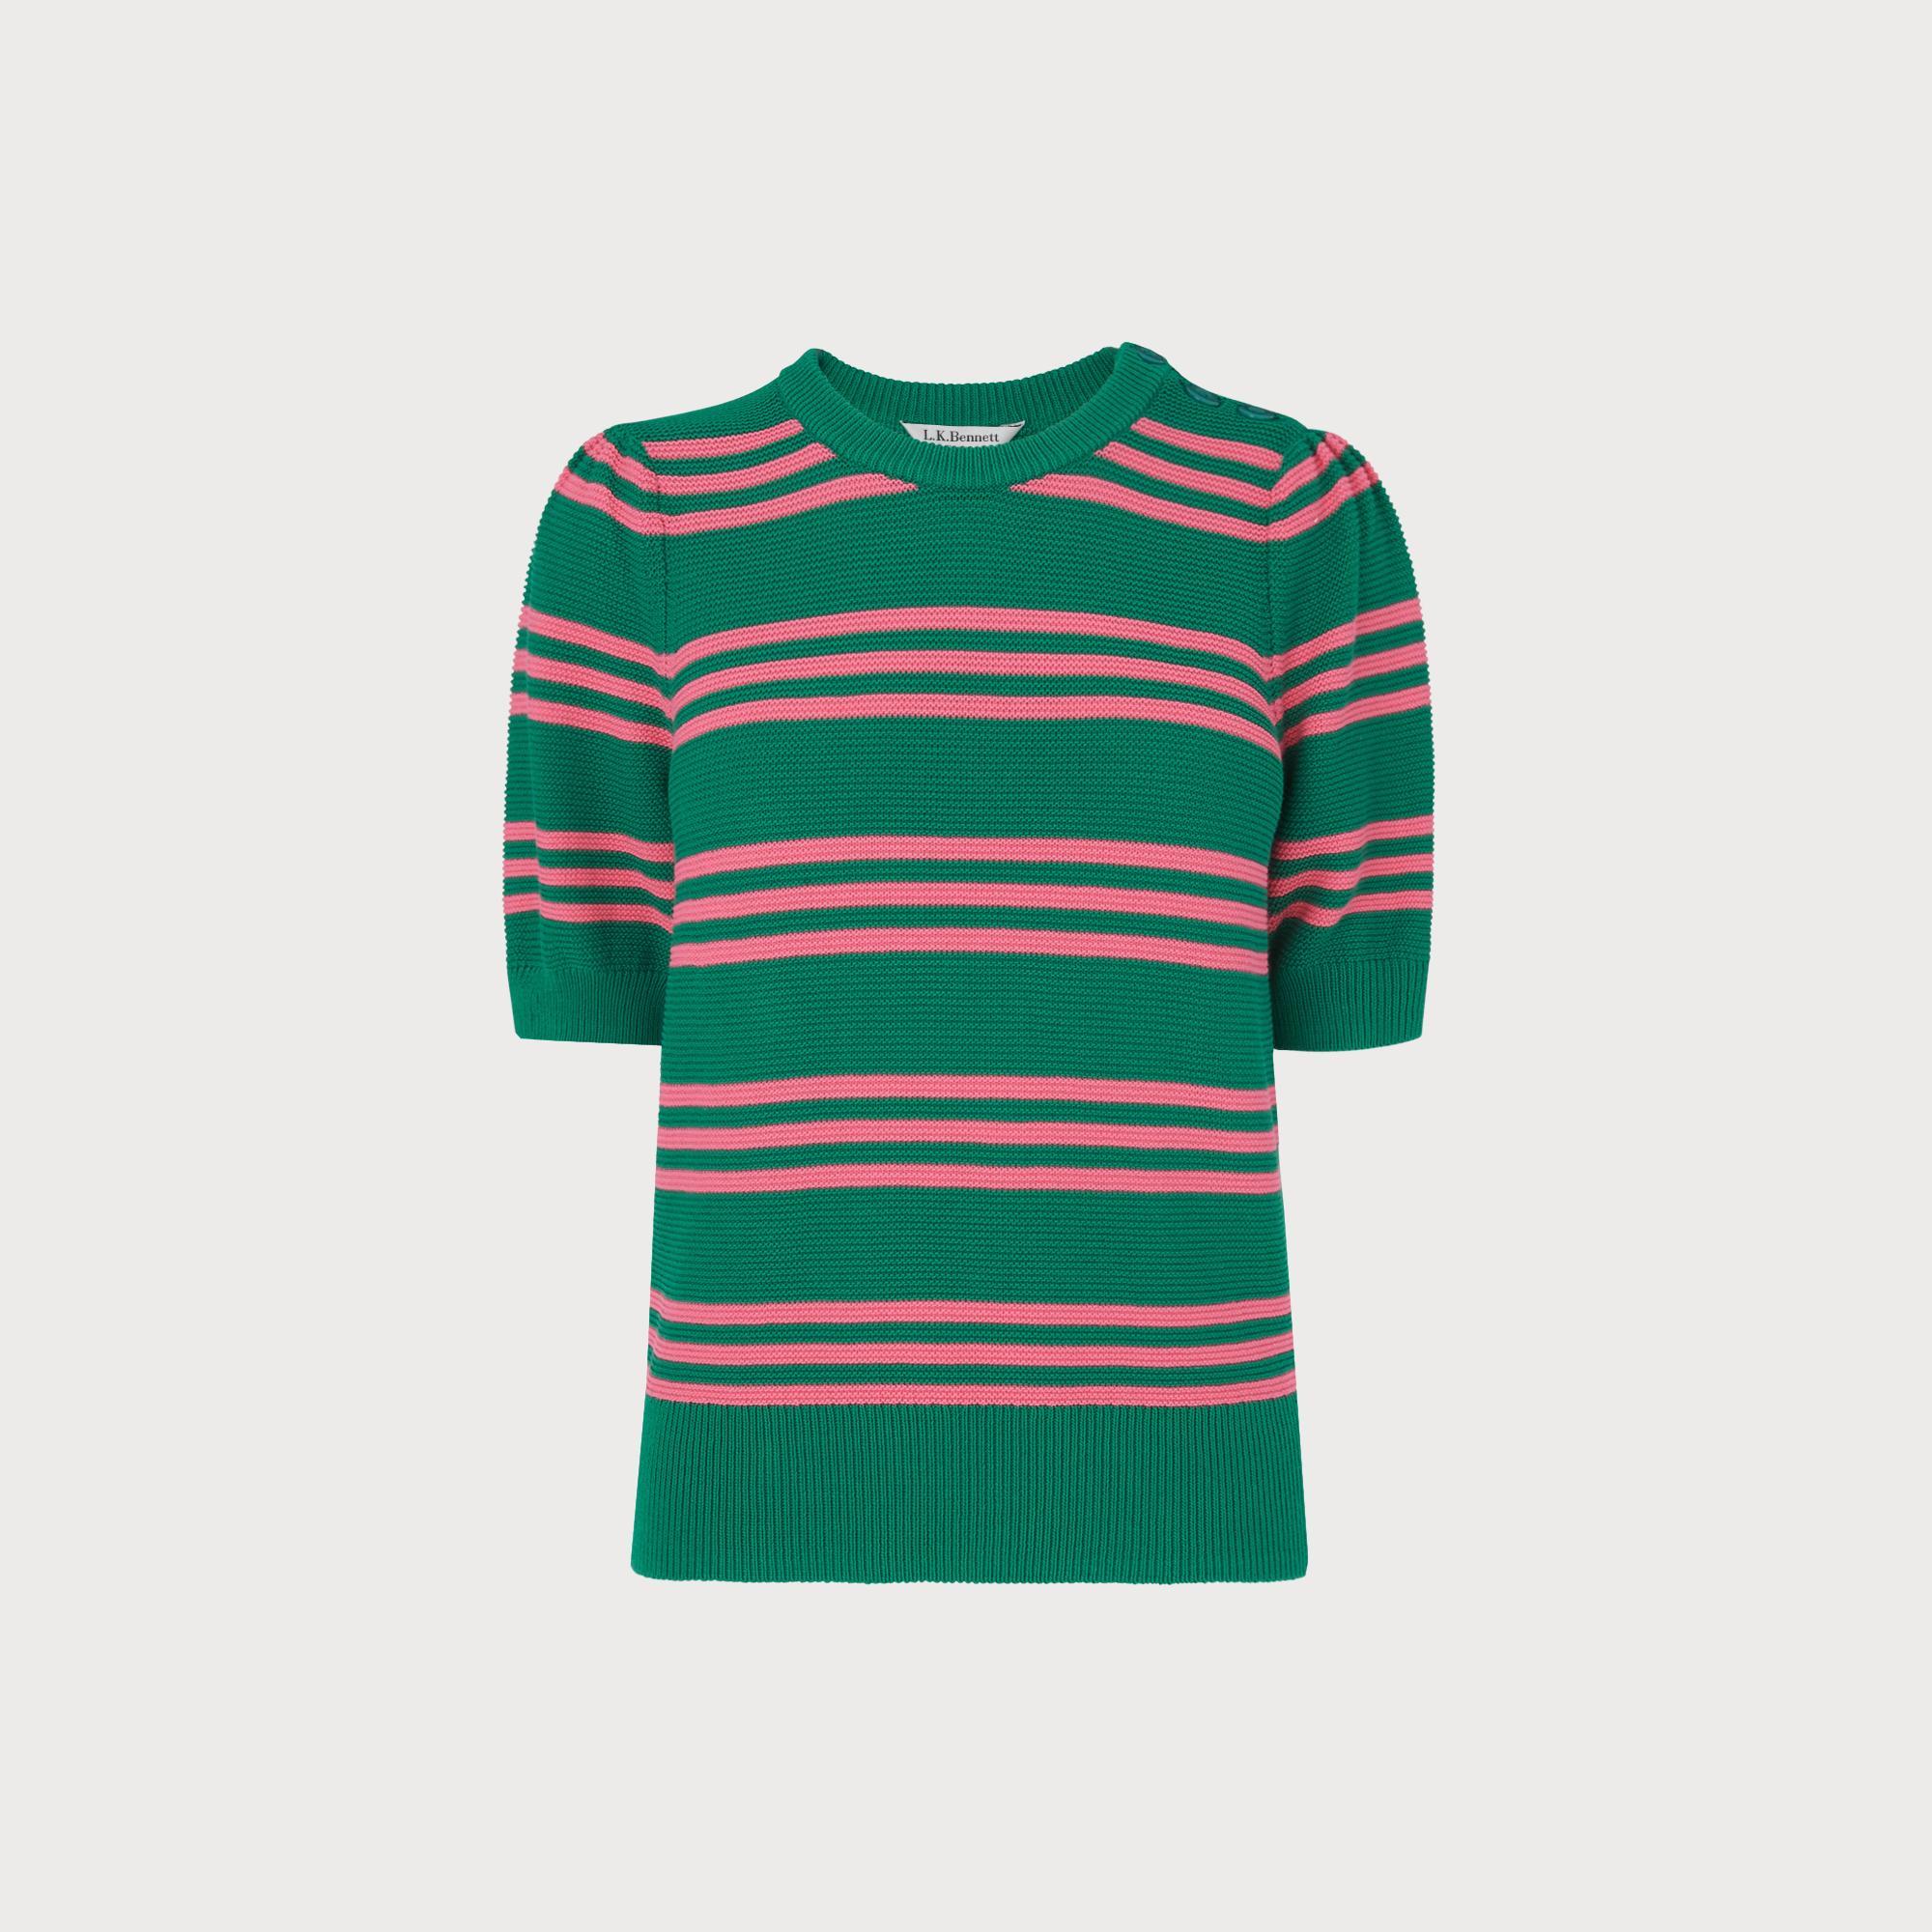 Isobel Green Cotton Striped Sweater by L.K.Bennett